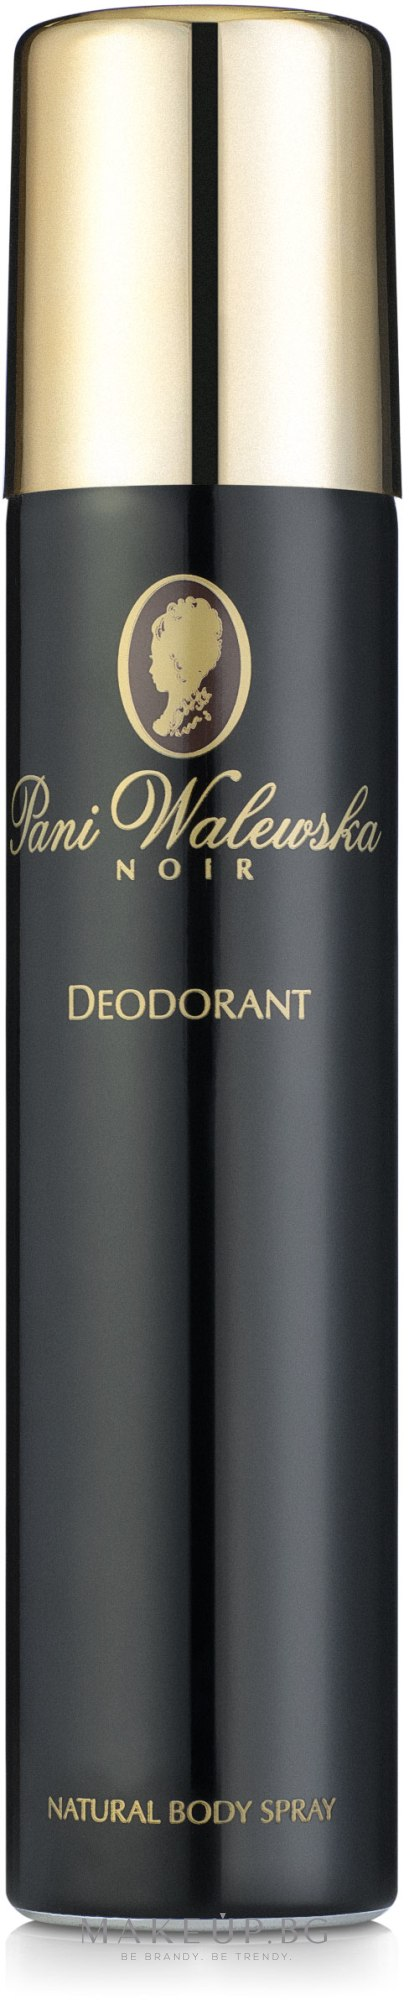 Pani Walewska Noir - Дезодорант — снимка 90 ml